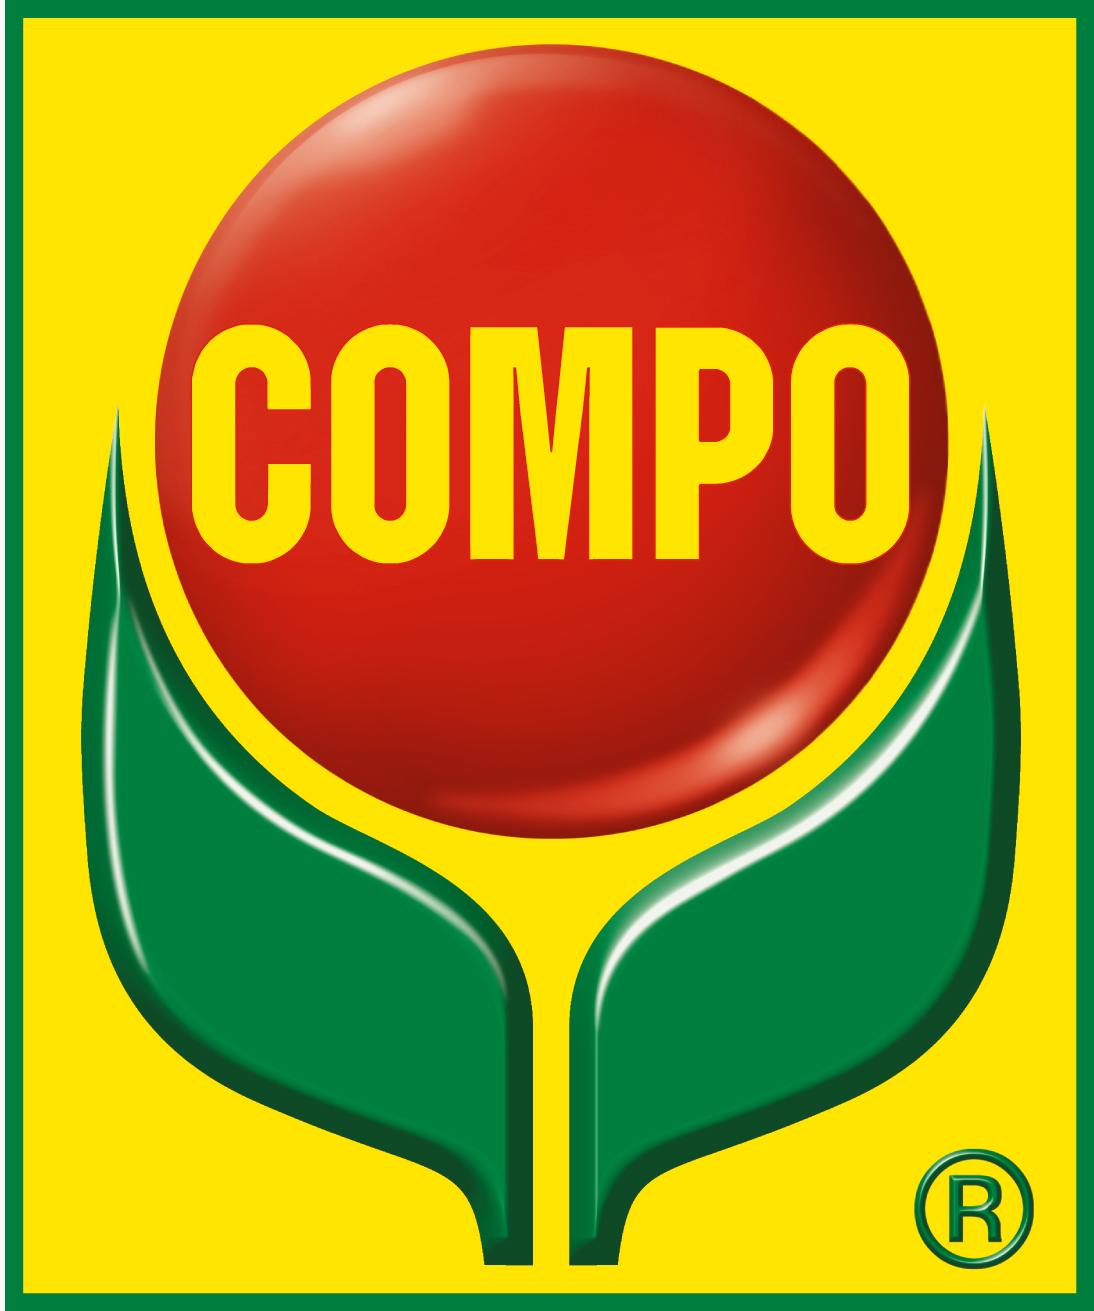 COMPO SANA